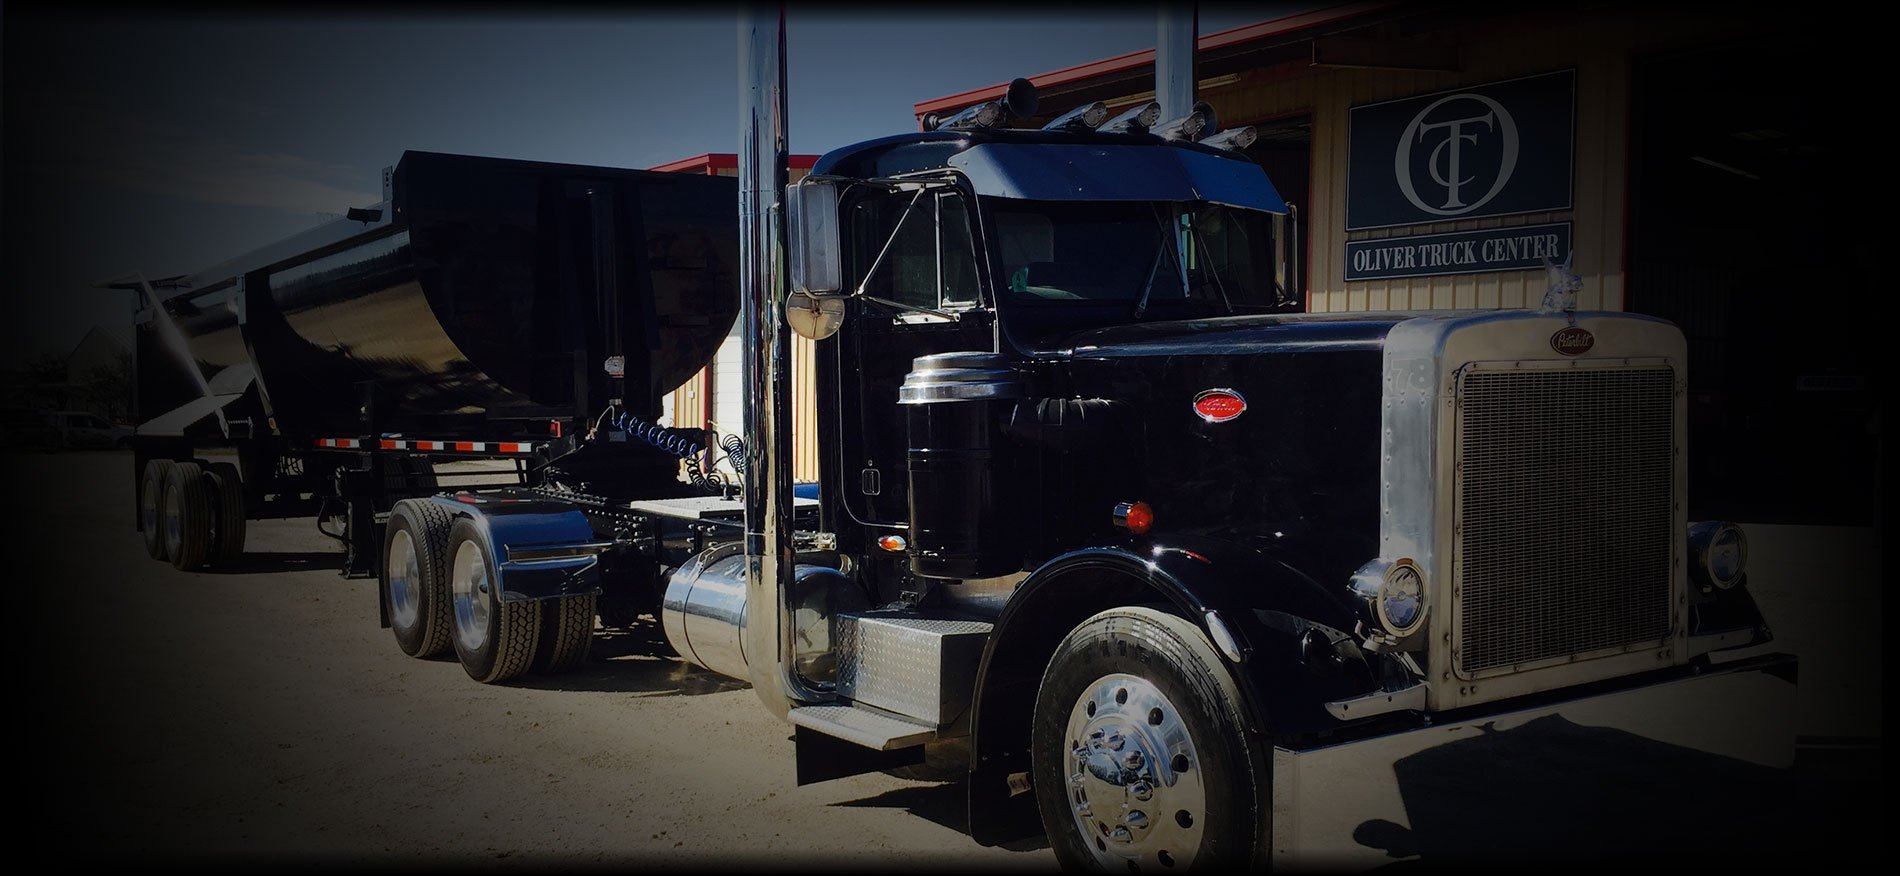 Used Trucks San Antonio >> Oliver Truck Center Trucks And Trailers